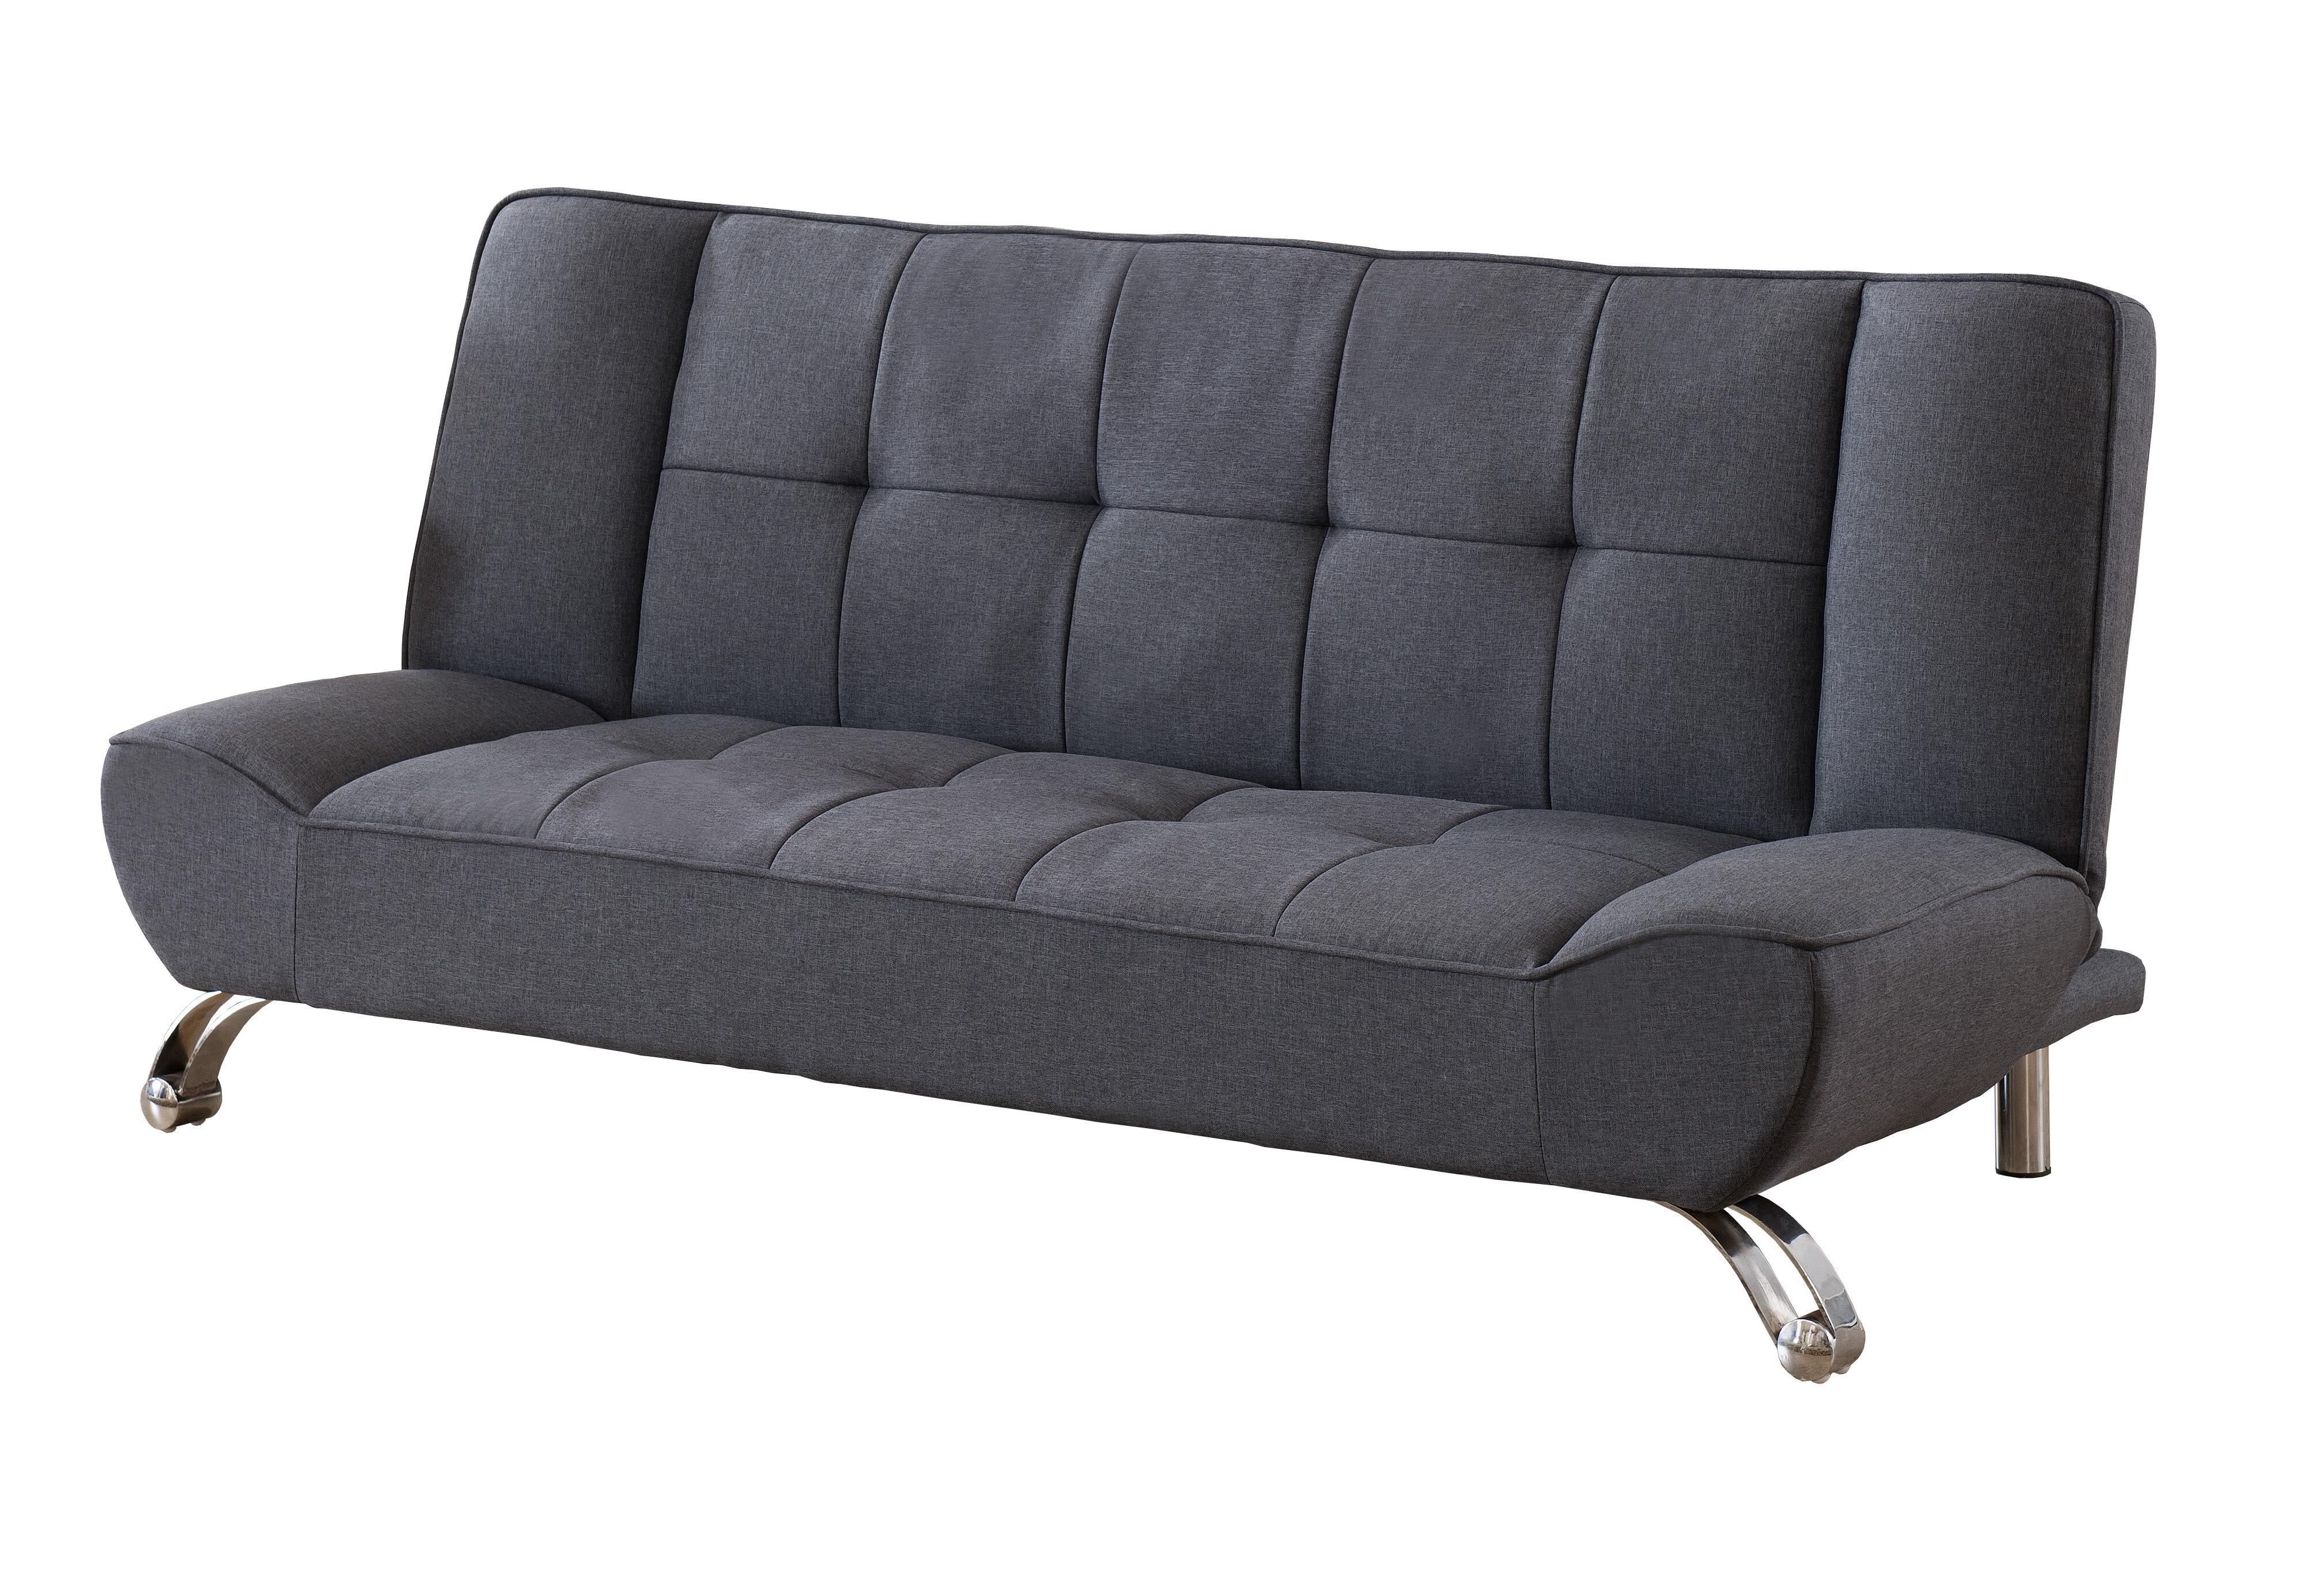 17 stories colyton 3 seater sofa bed reviews wayfair co uk